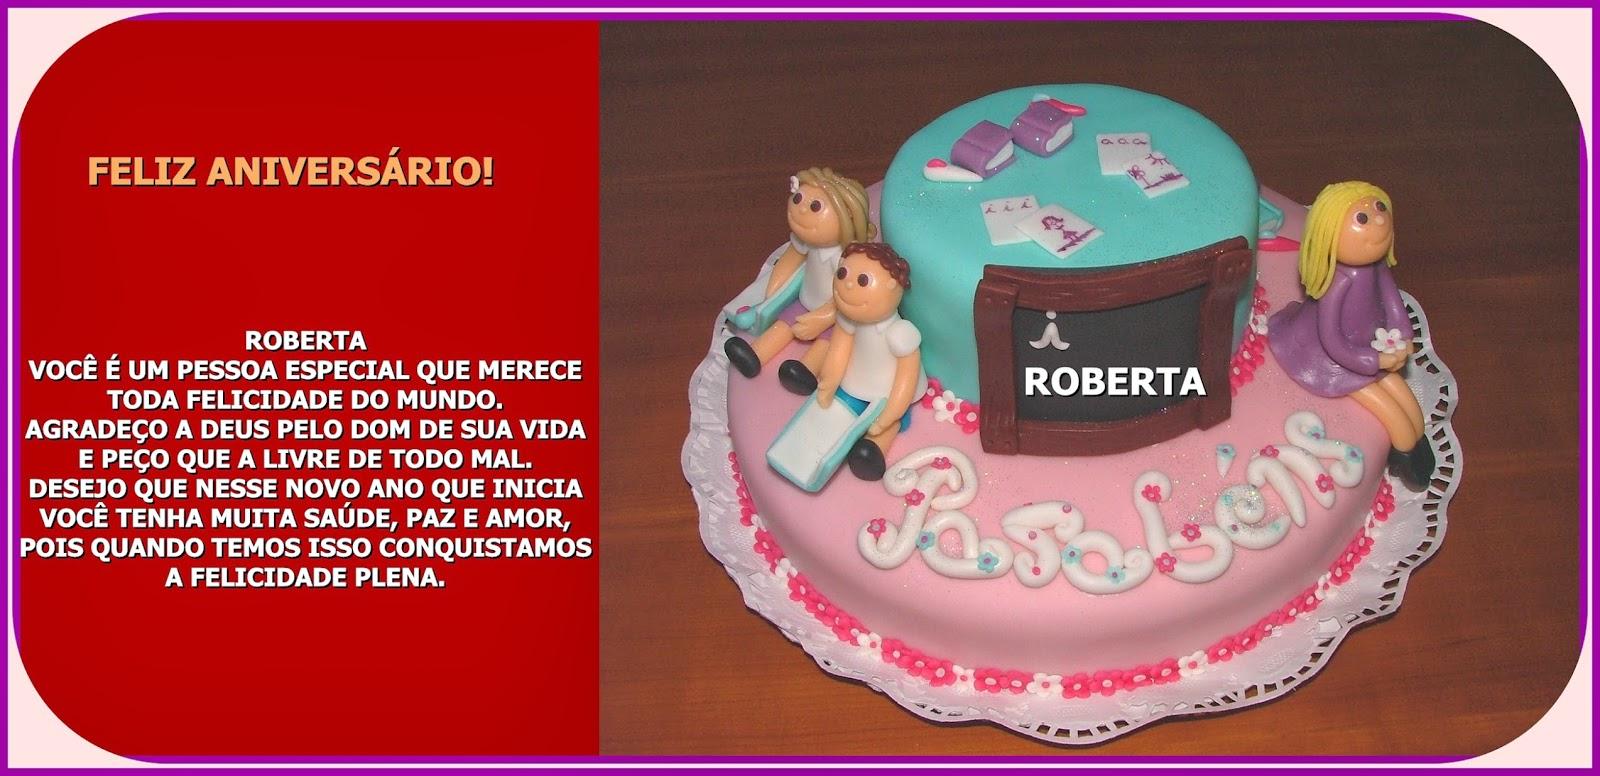 Feliz Aniversário Vovó Feliz: MENSAGENS DA VOVÓ VAL: ANIVERSÁRIO AMIGOS 2014